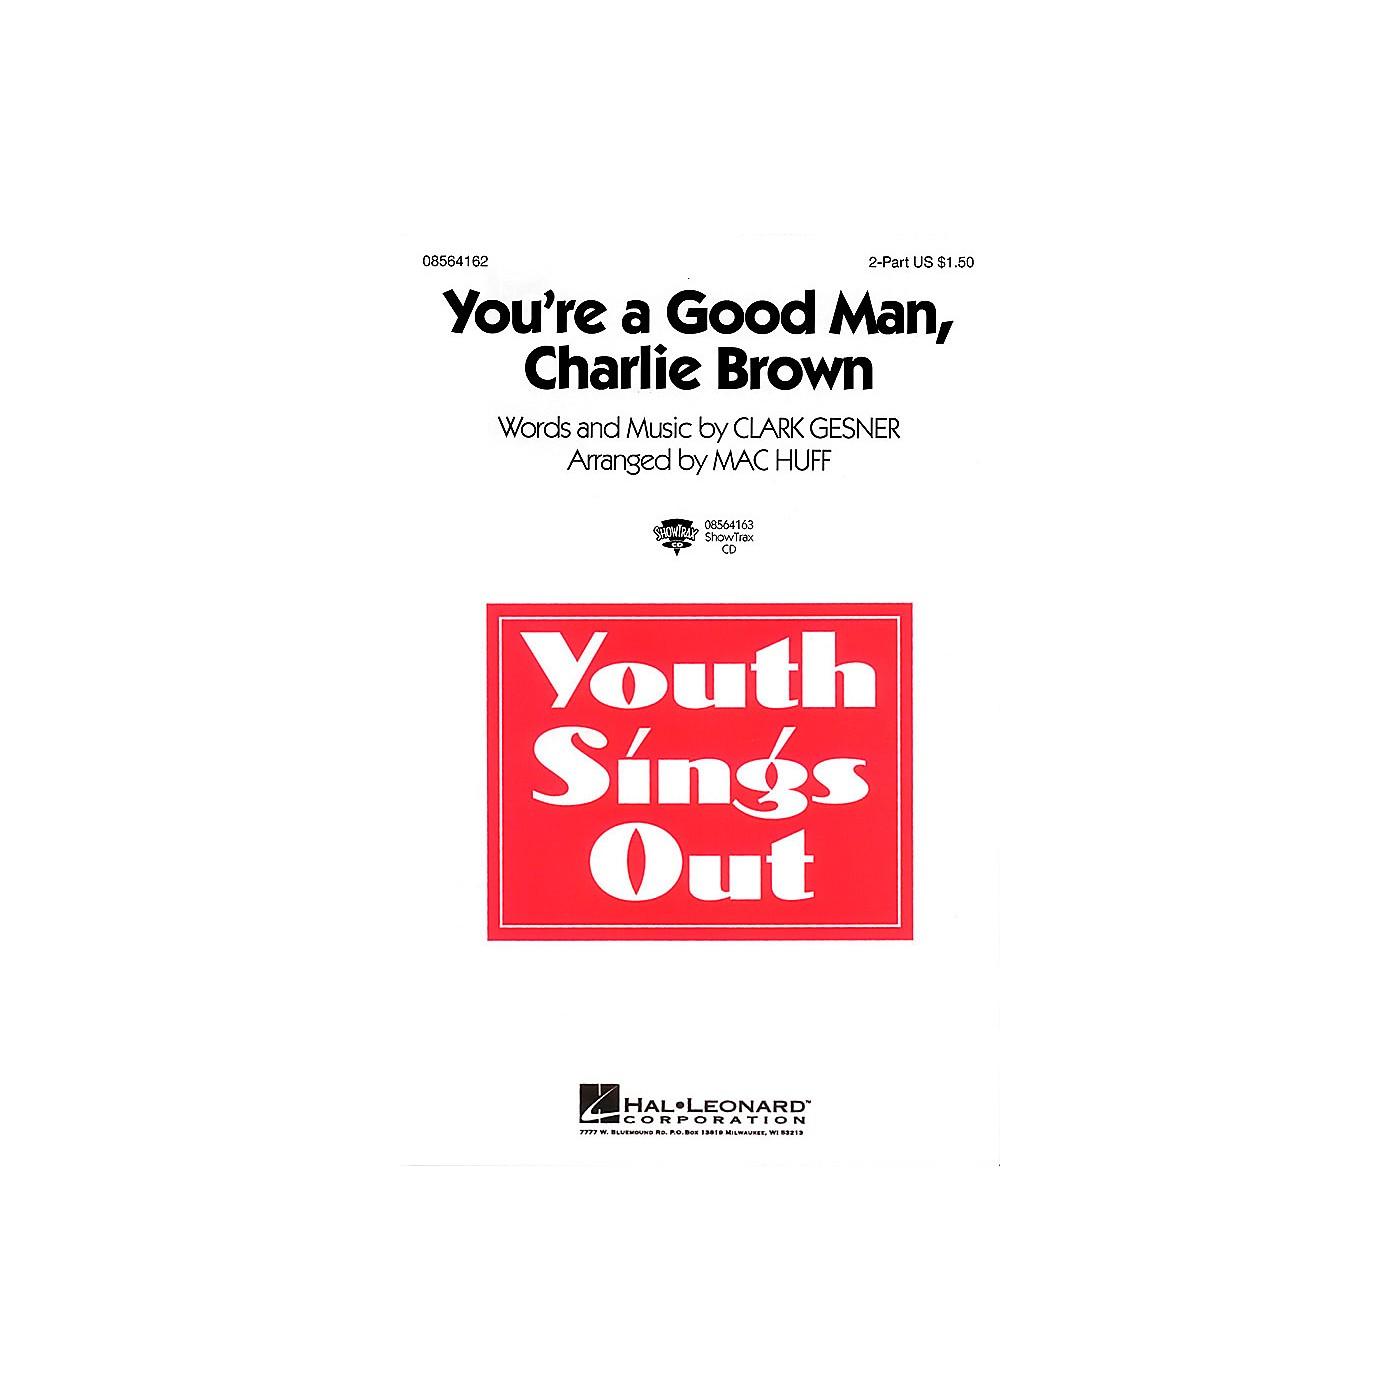 Hal Leonard You're a Good Man, Charlie Brown 2-Part arranged by Mac Huff thumbnail